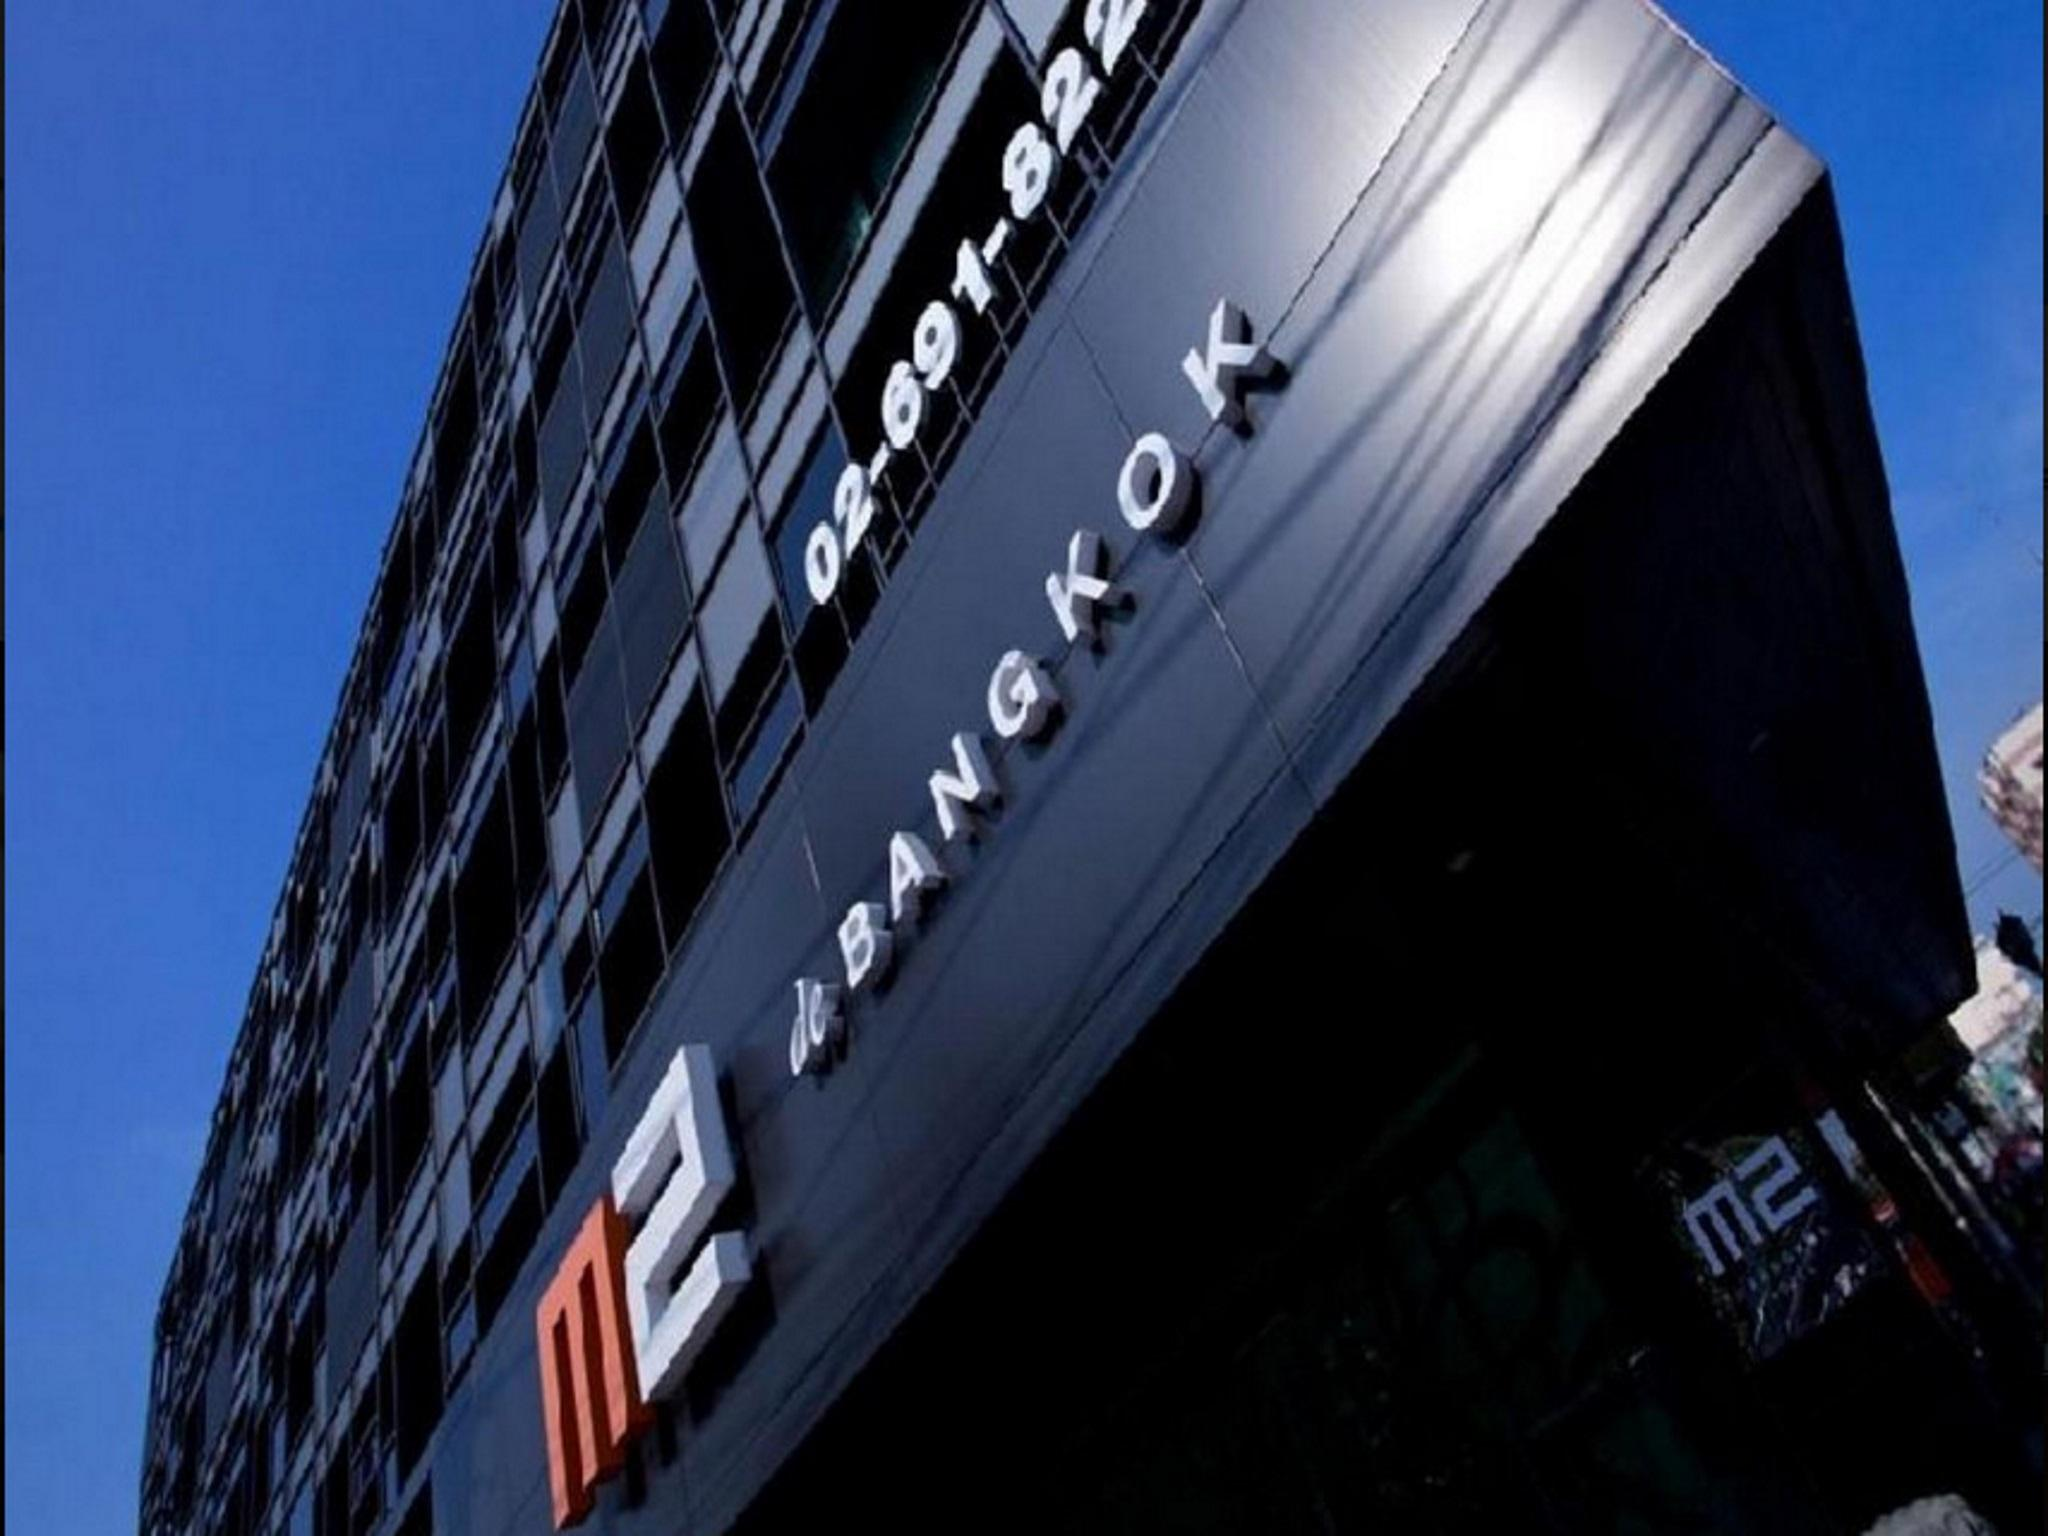 M2 デ バンコク ホテル (M2 De Bangkok Hotel)